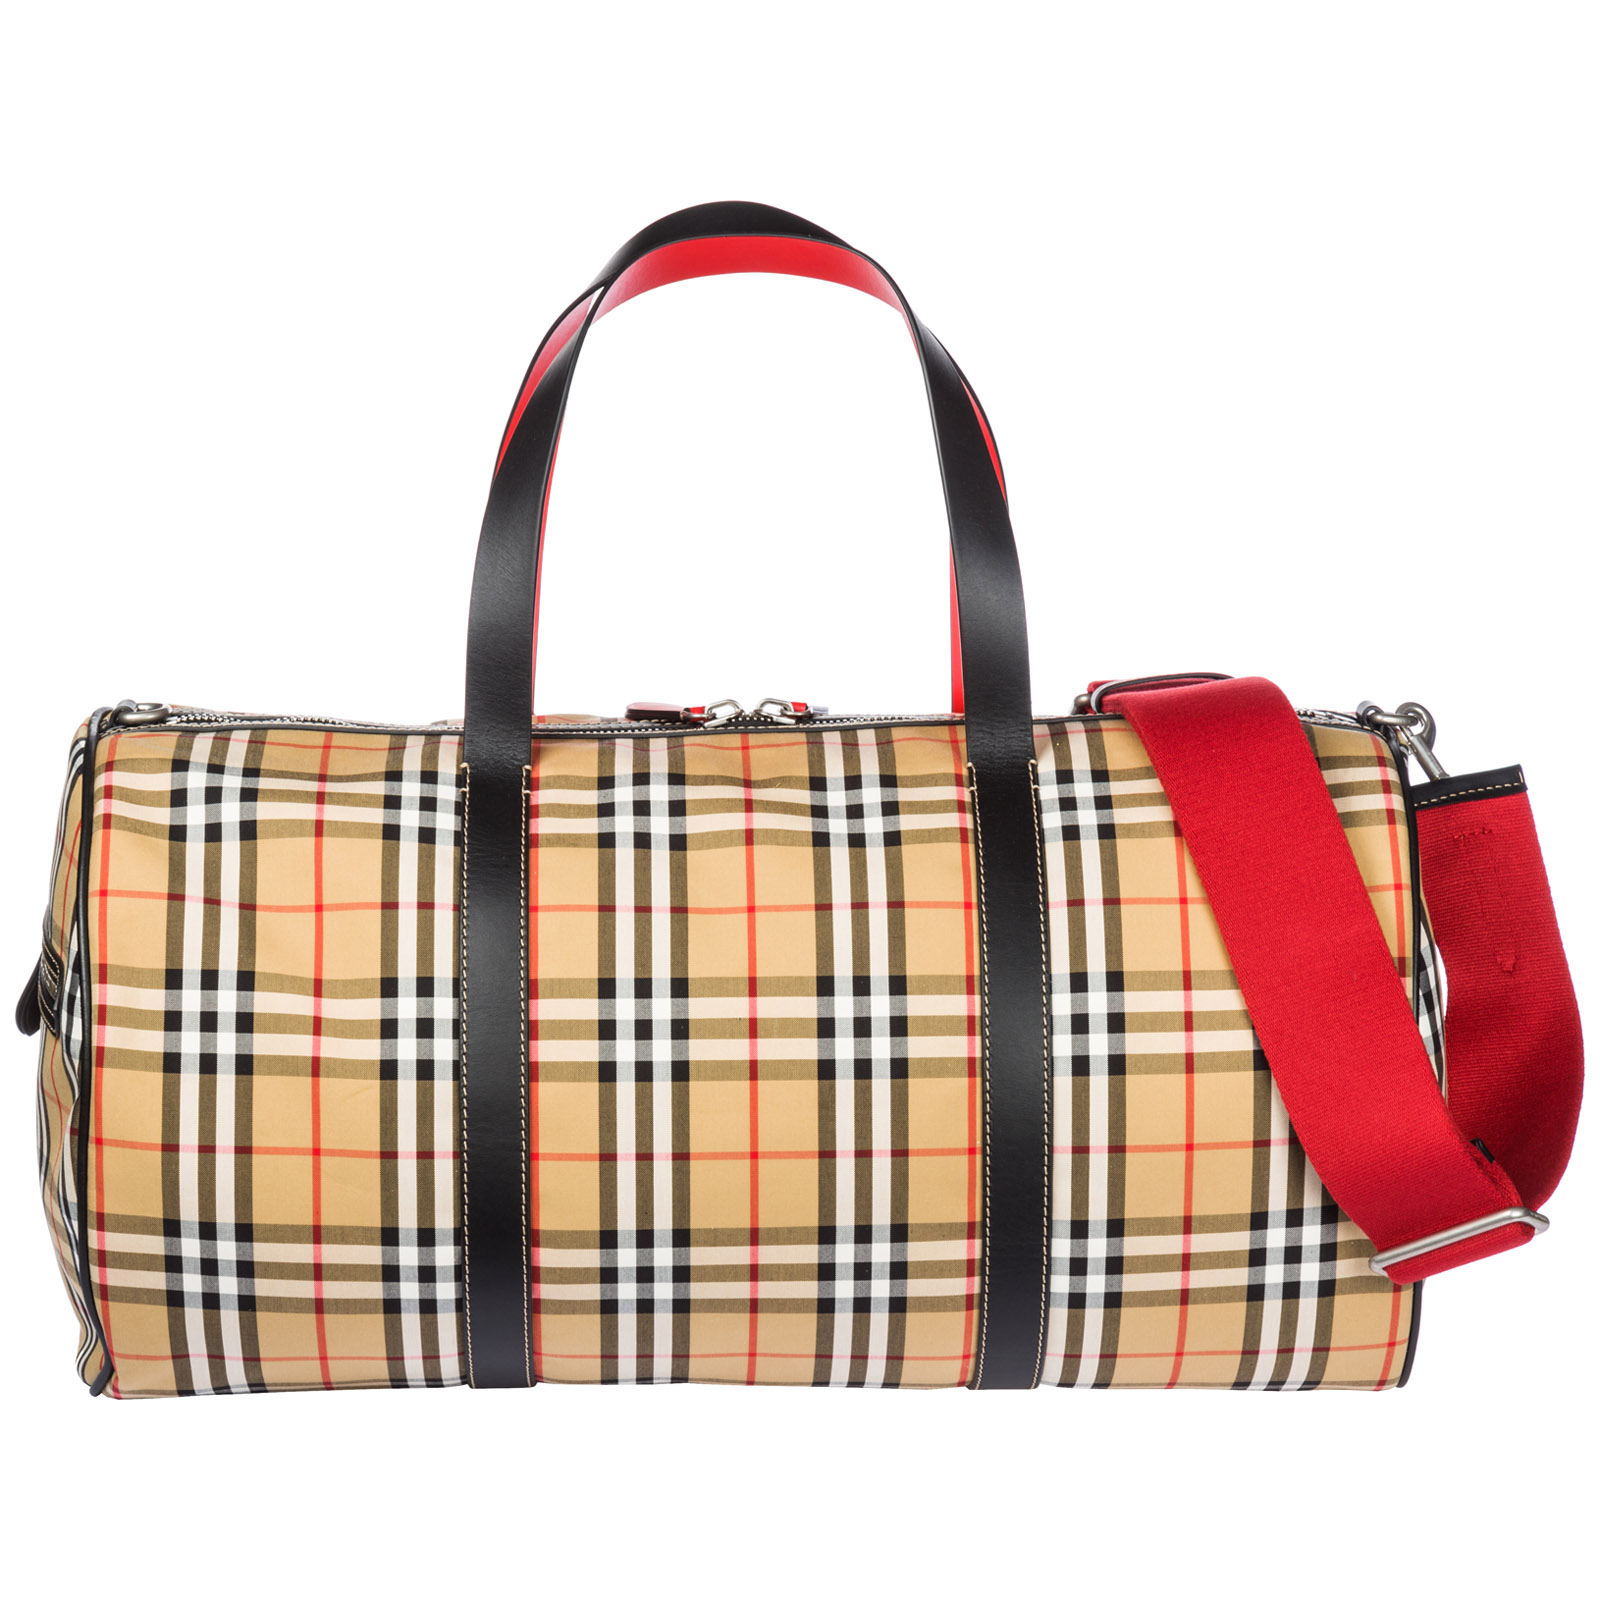 94d4bf85b316 Burberry Travel duffle weekend shoulder bag kennedy